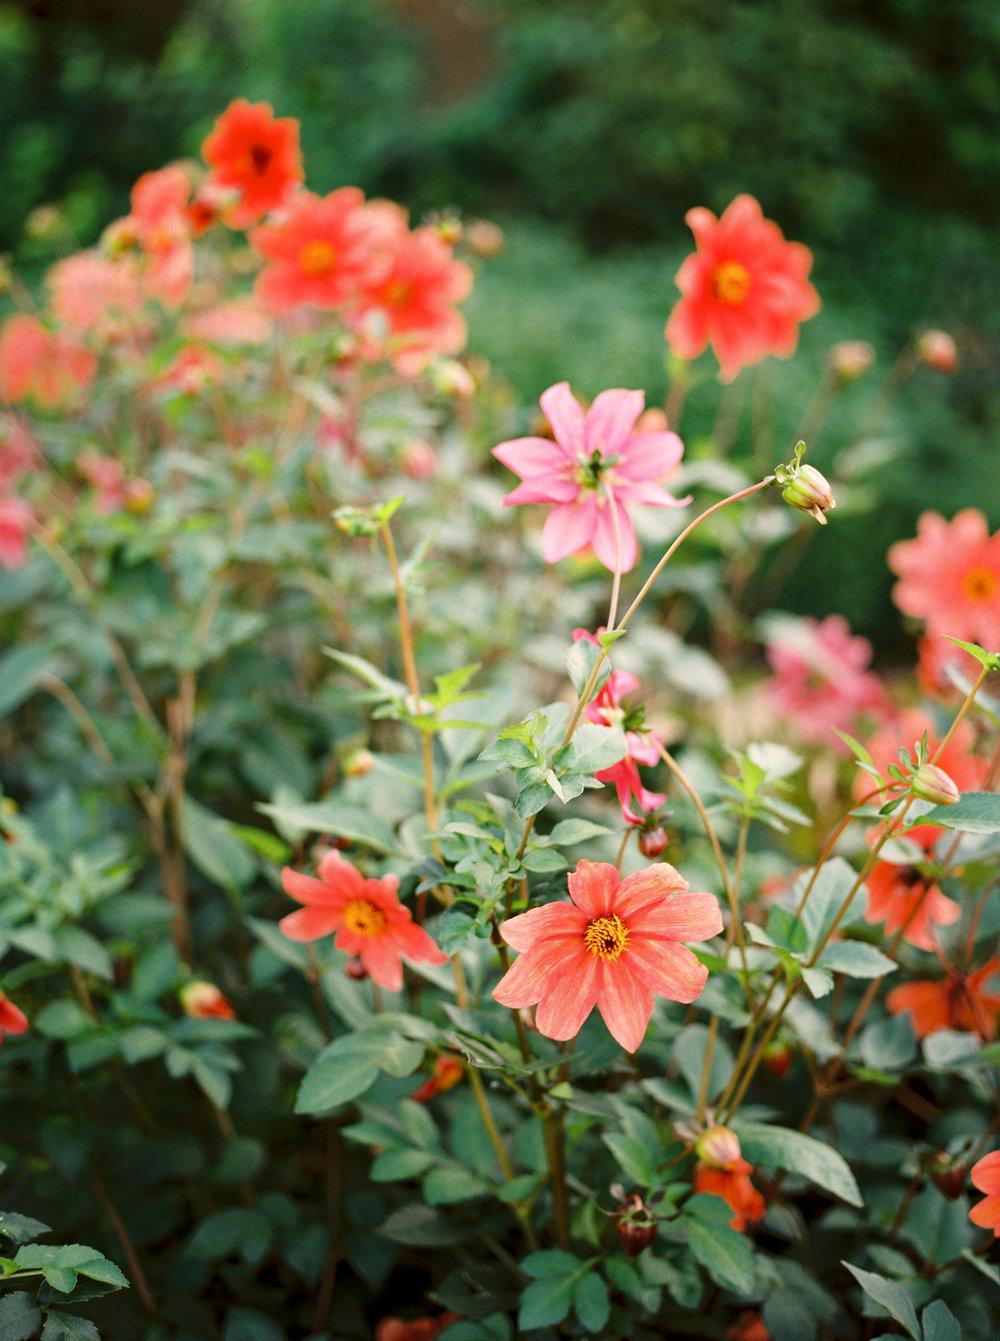 autumn flowers in dorset